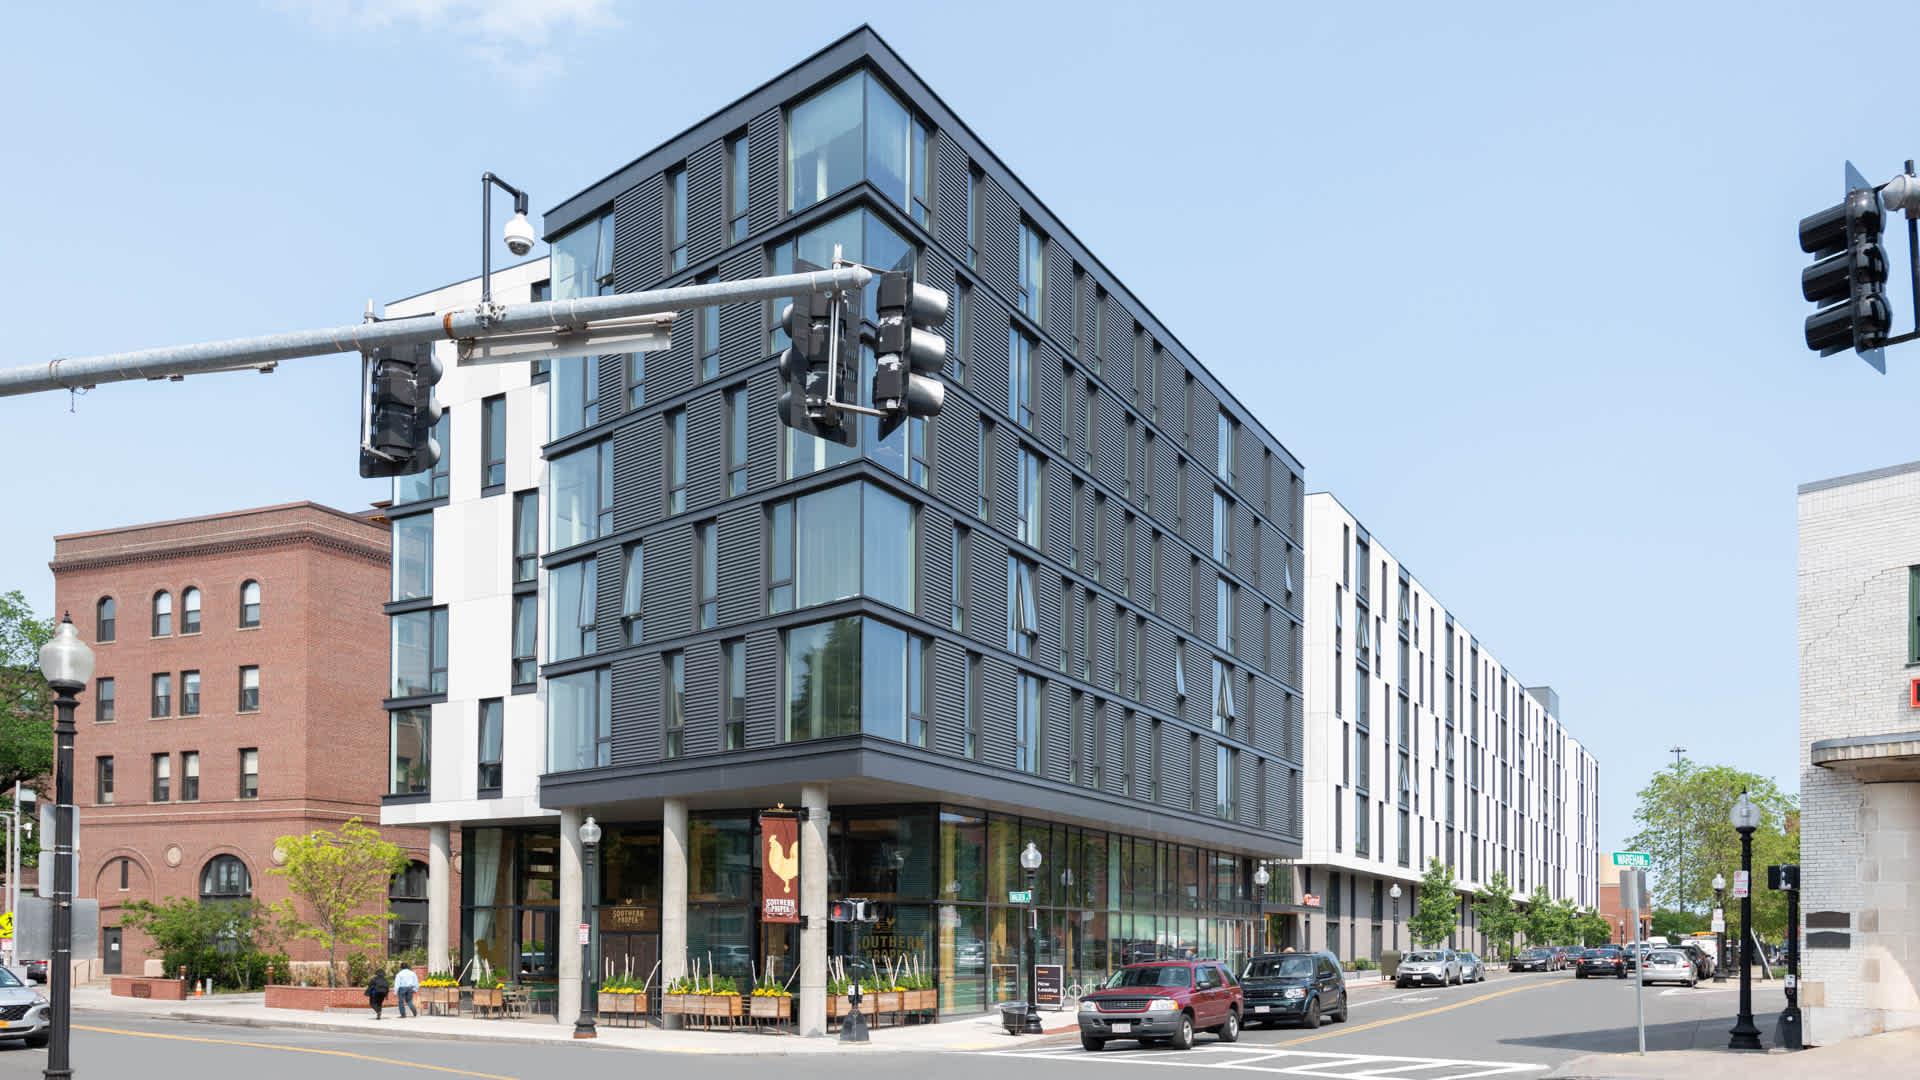 Girard apartments exterior